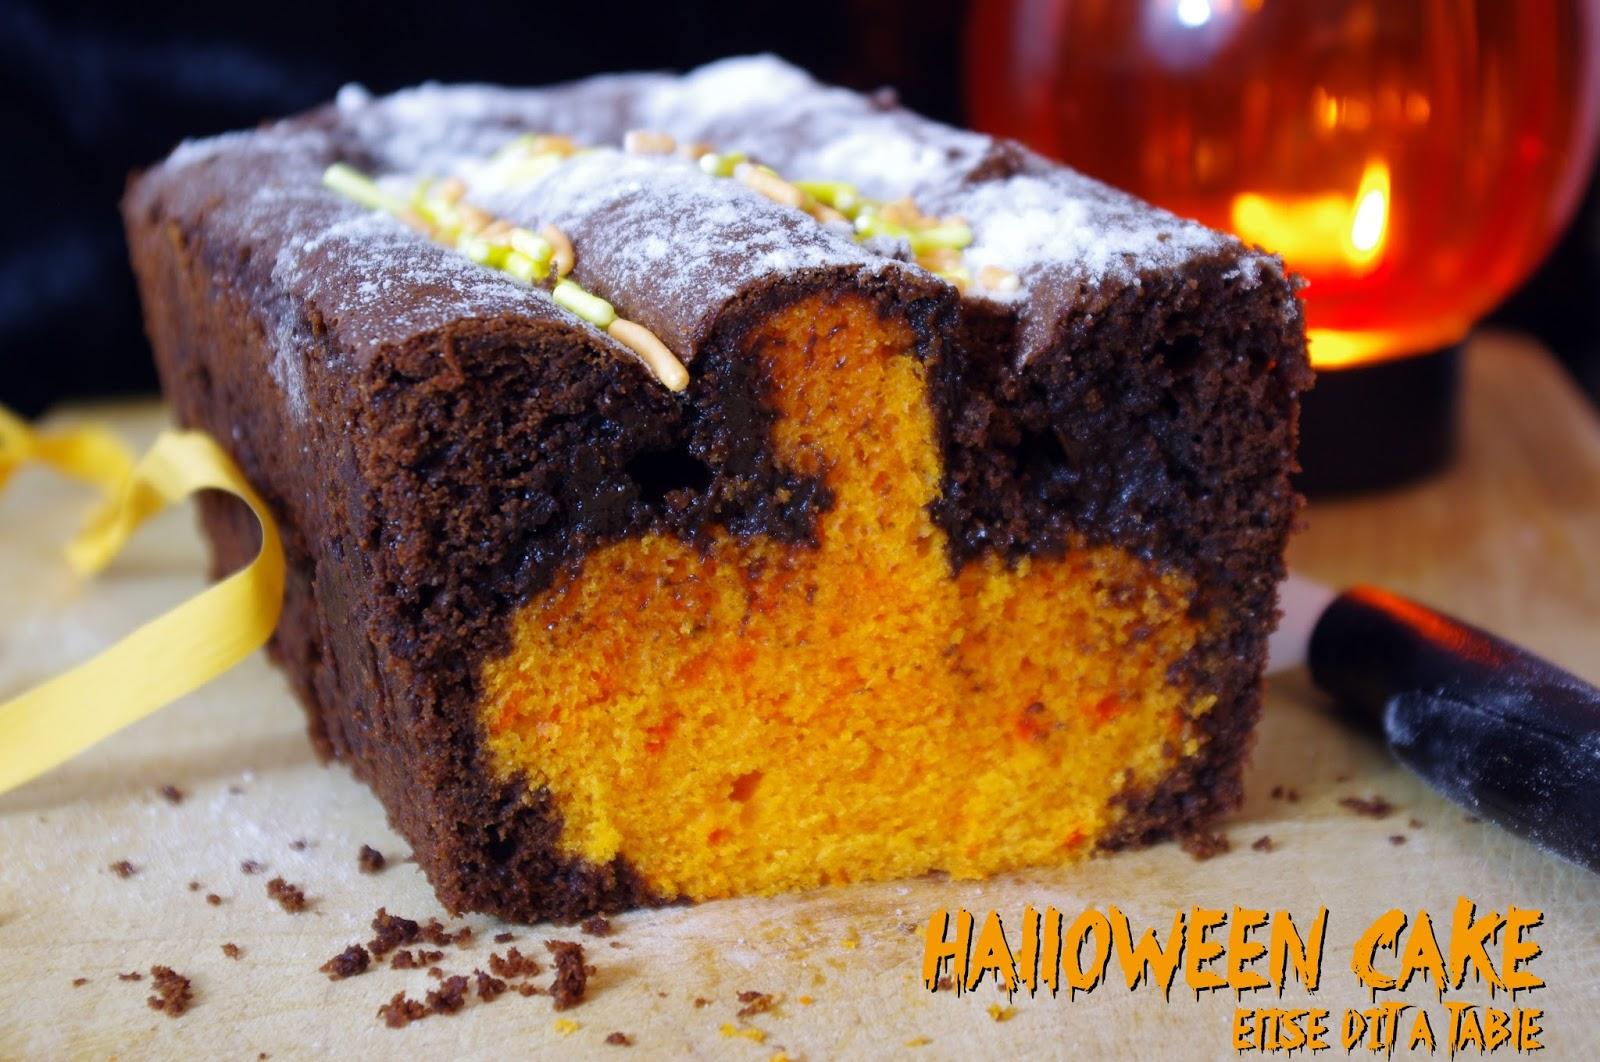 Recette halloween cake blog cuisine - Recette dessert halloween ...